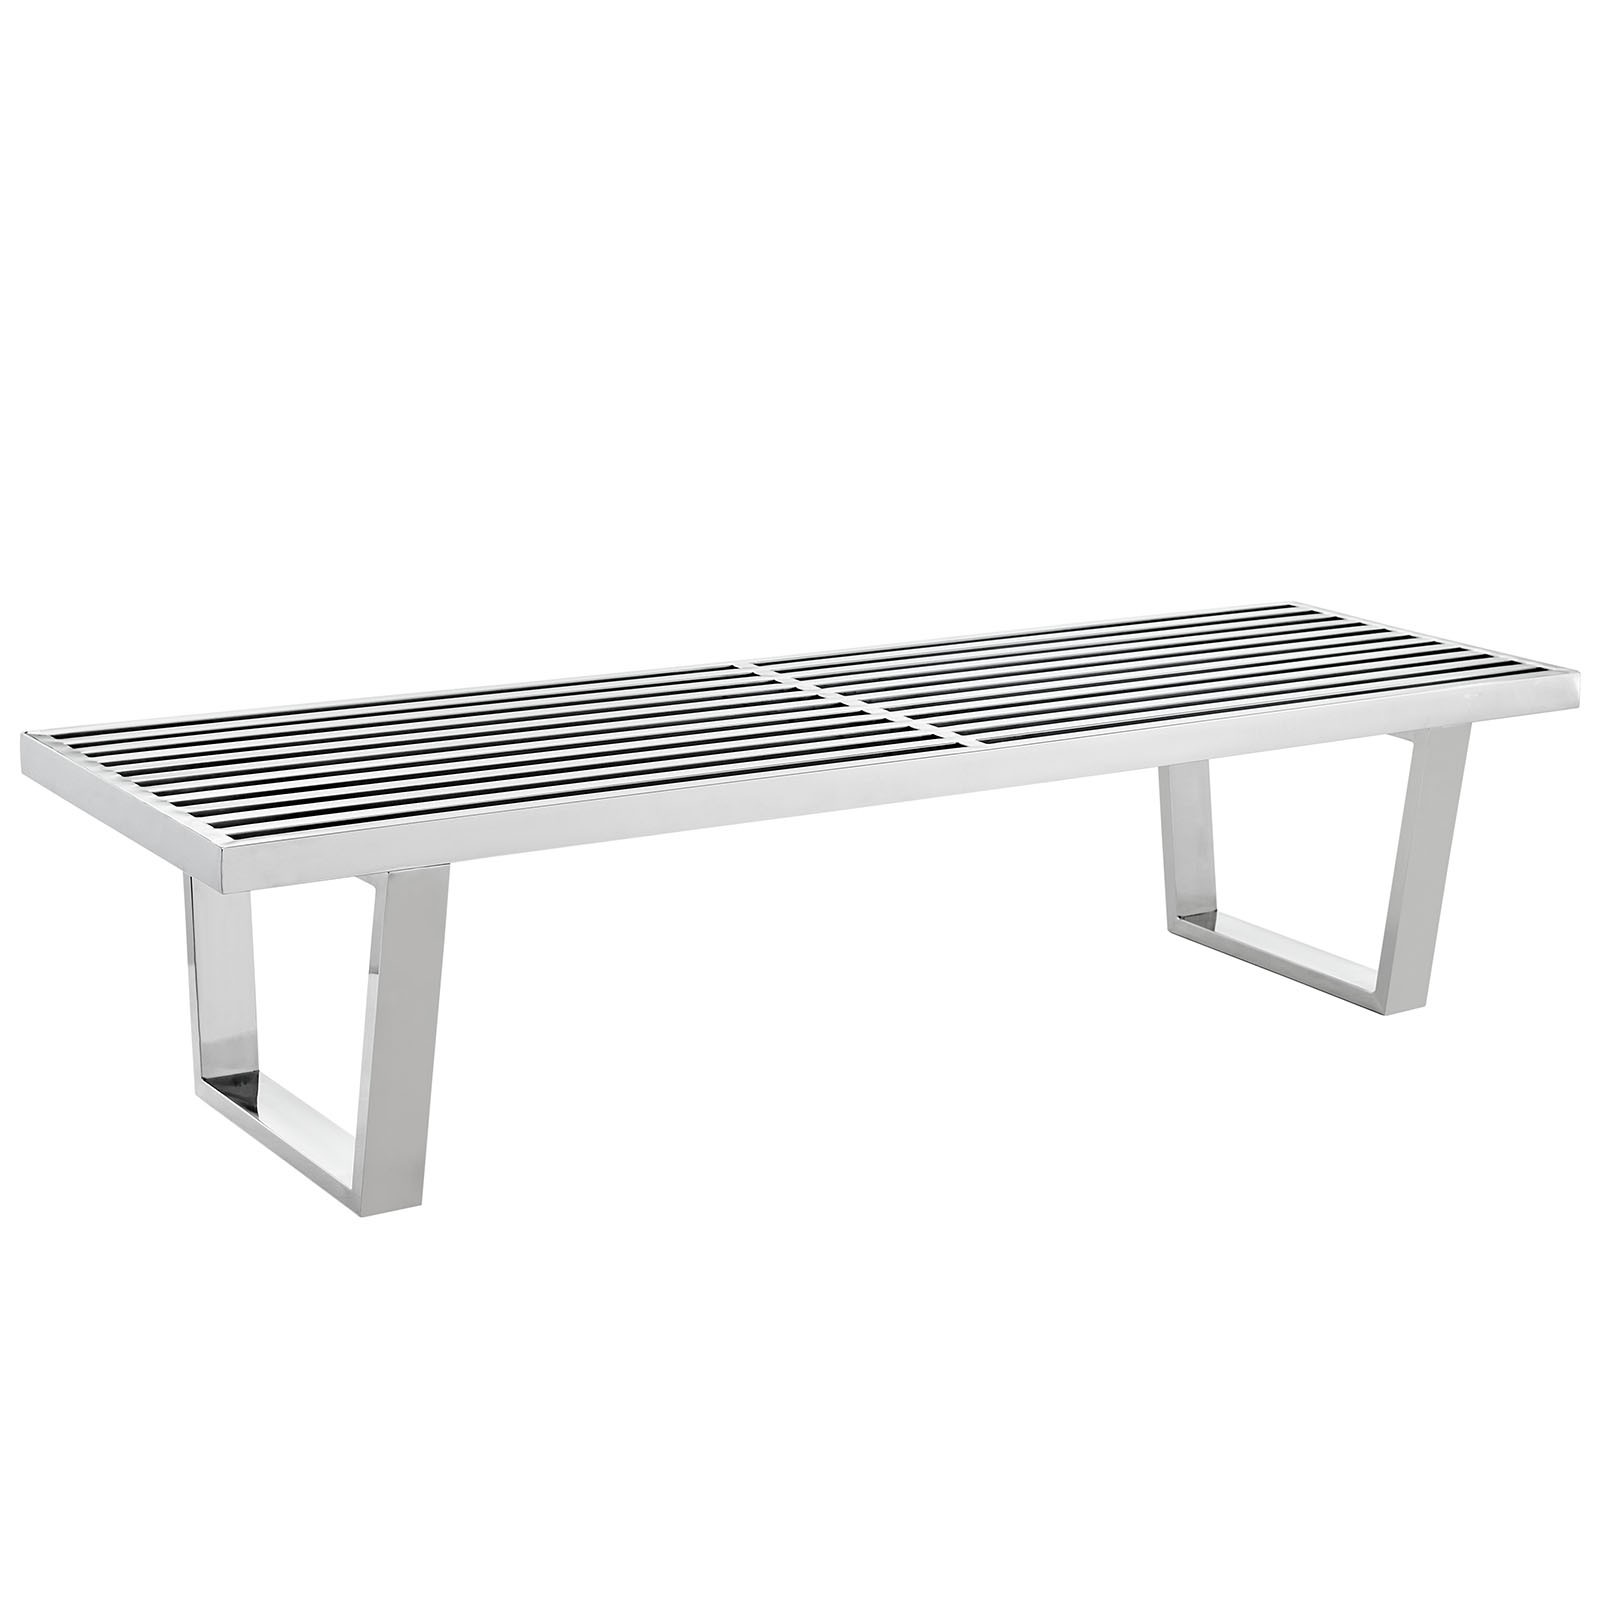 Sauna 5' Stainless Steel Bench